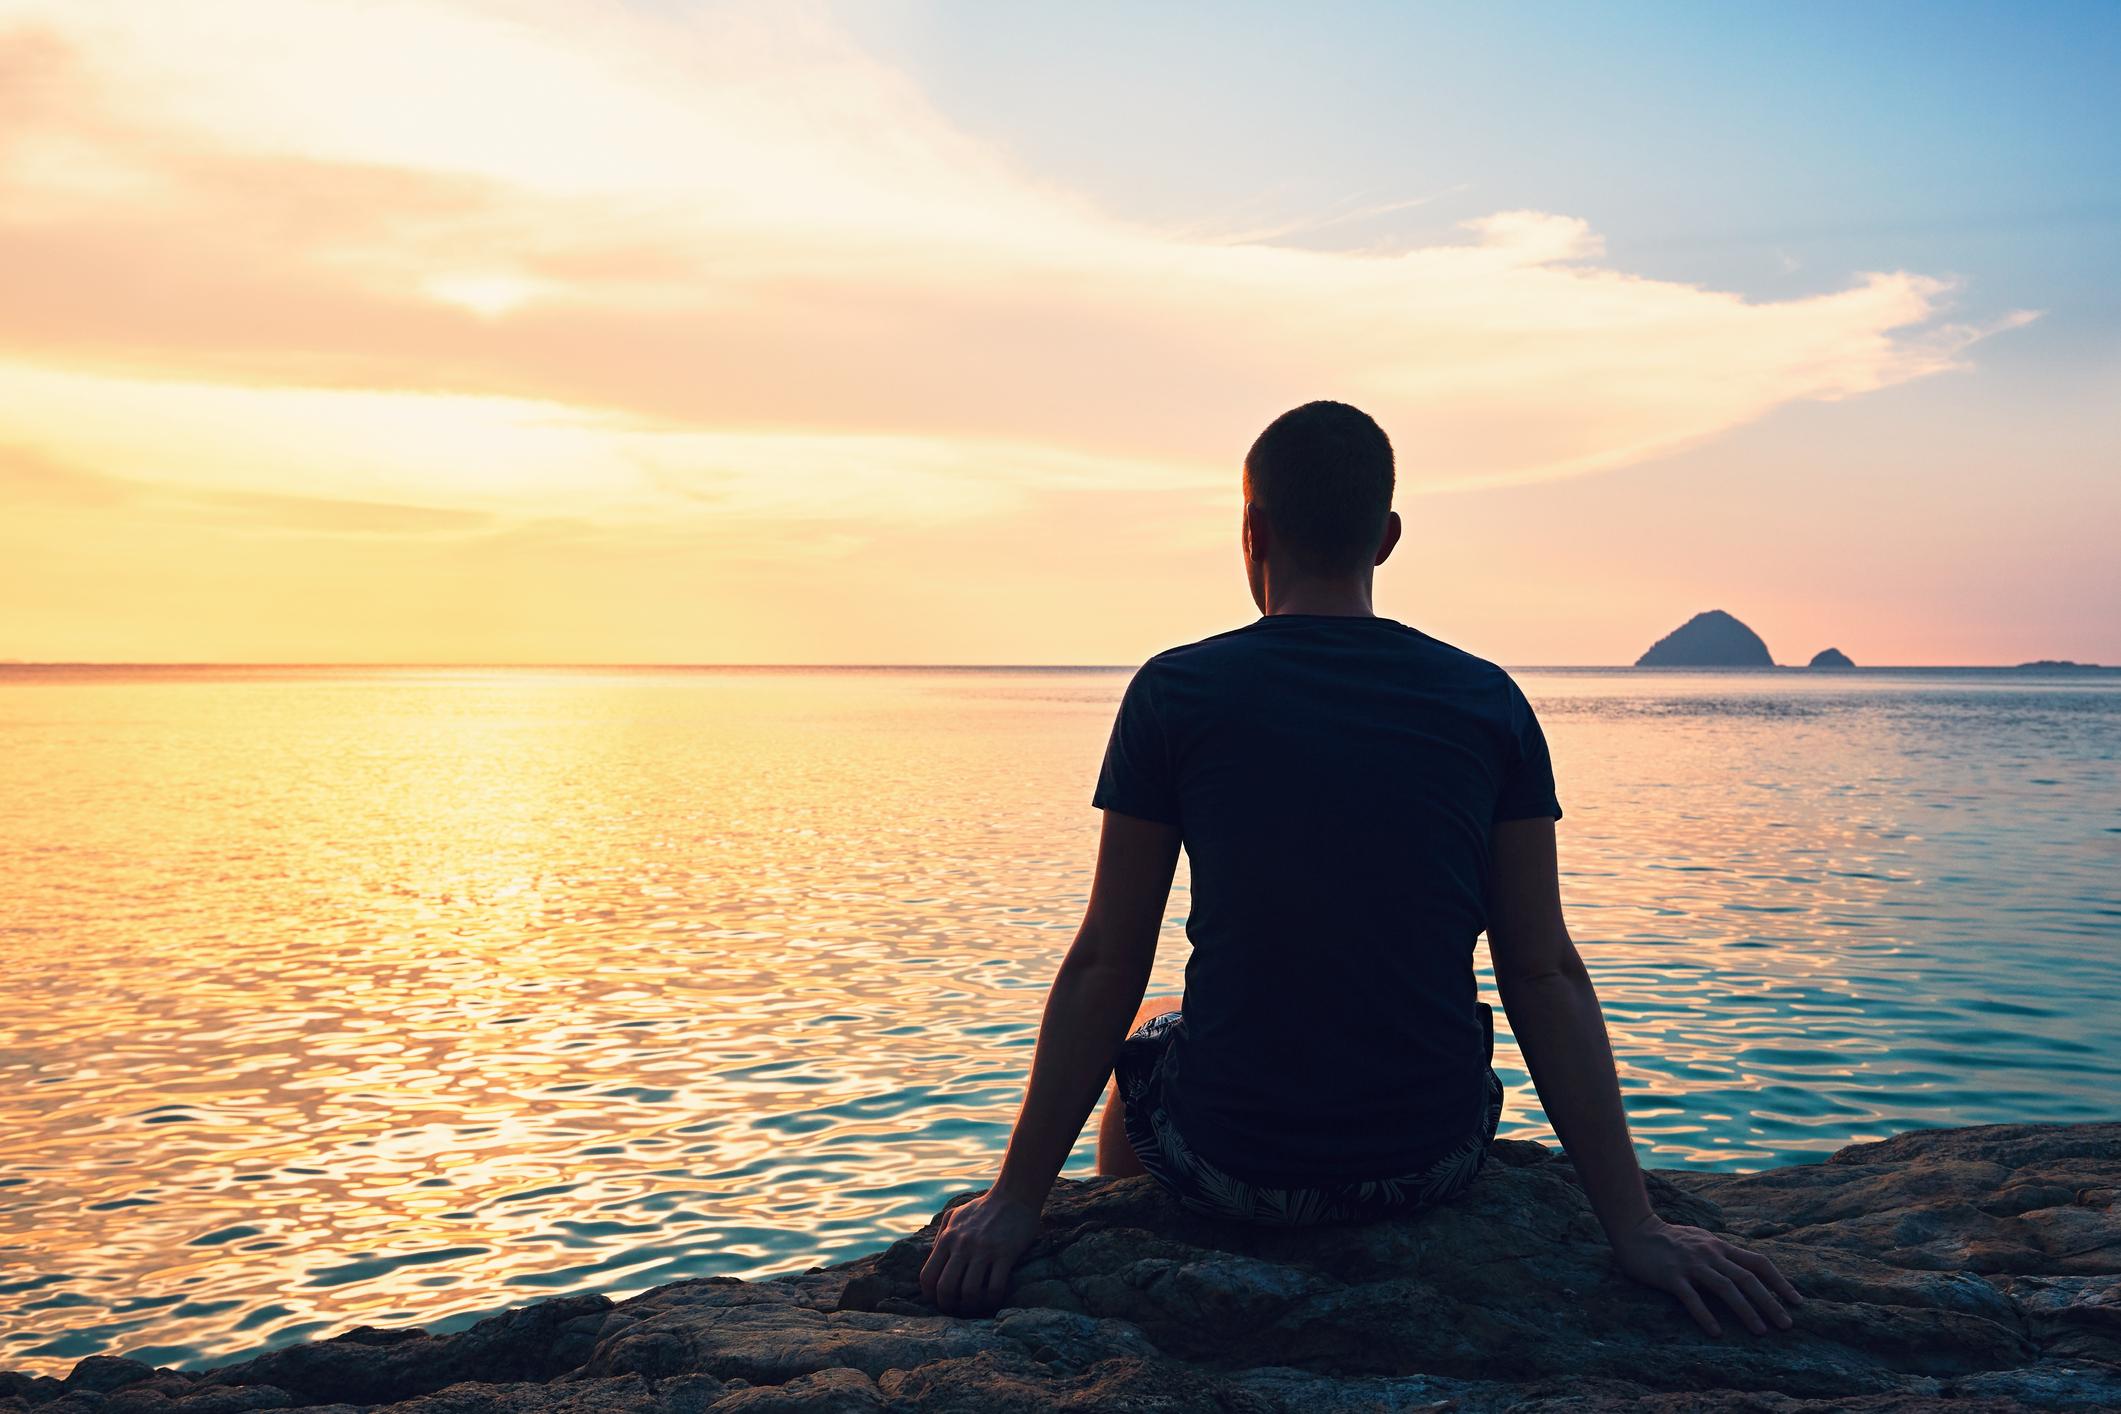 Man sitting facing the water at sunset